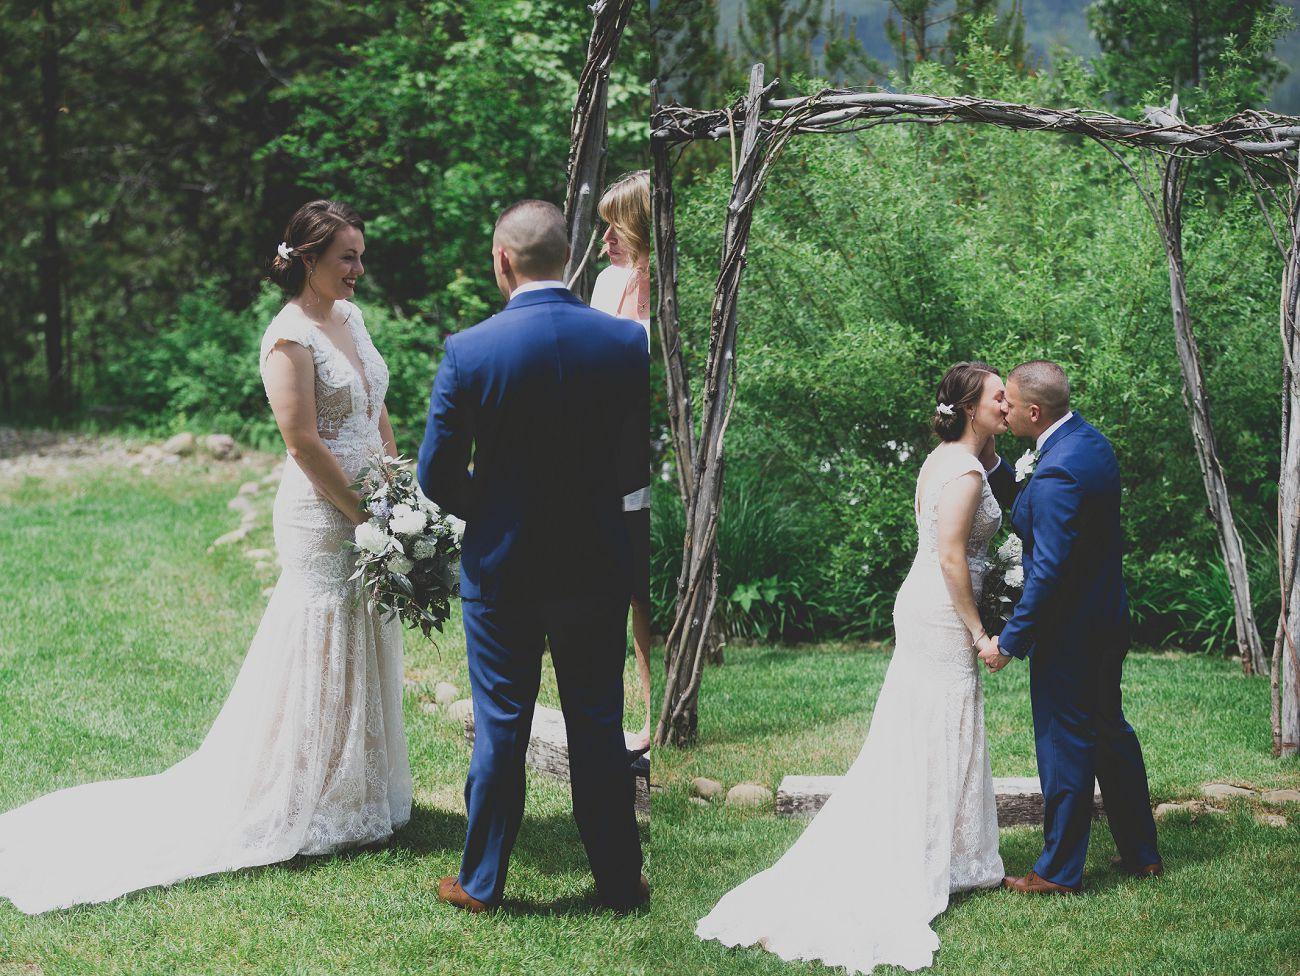 Jennifer_Mooney_Photo_Glacier_Park_Weddings_Elopement_00025.jpg